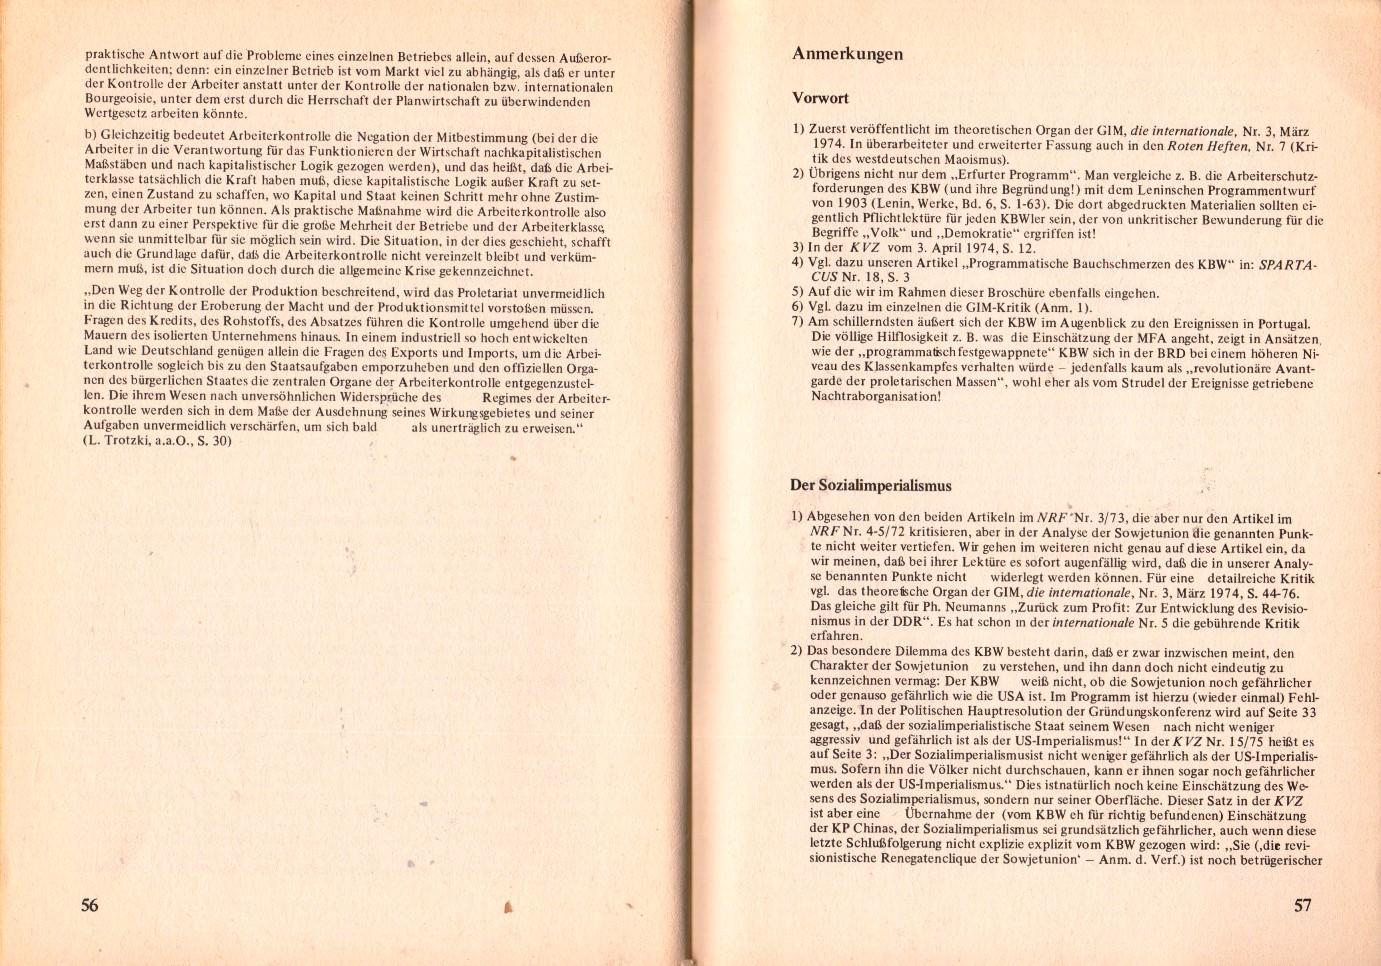 Spartacus_1975_Kritik_des_KBW_30